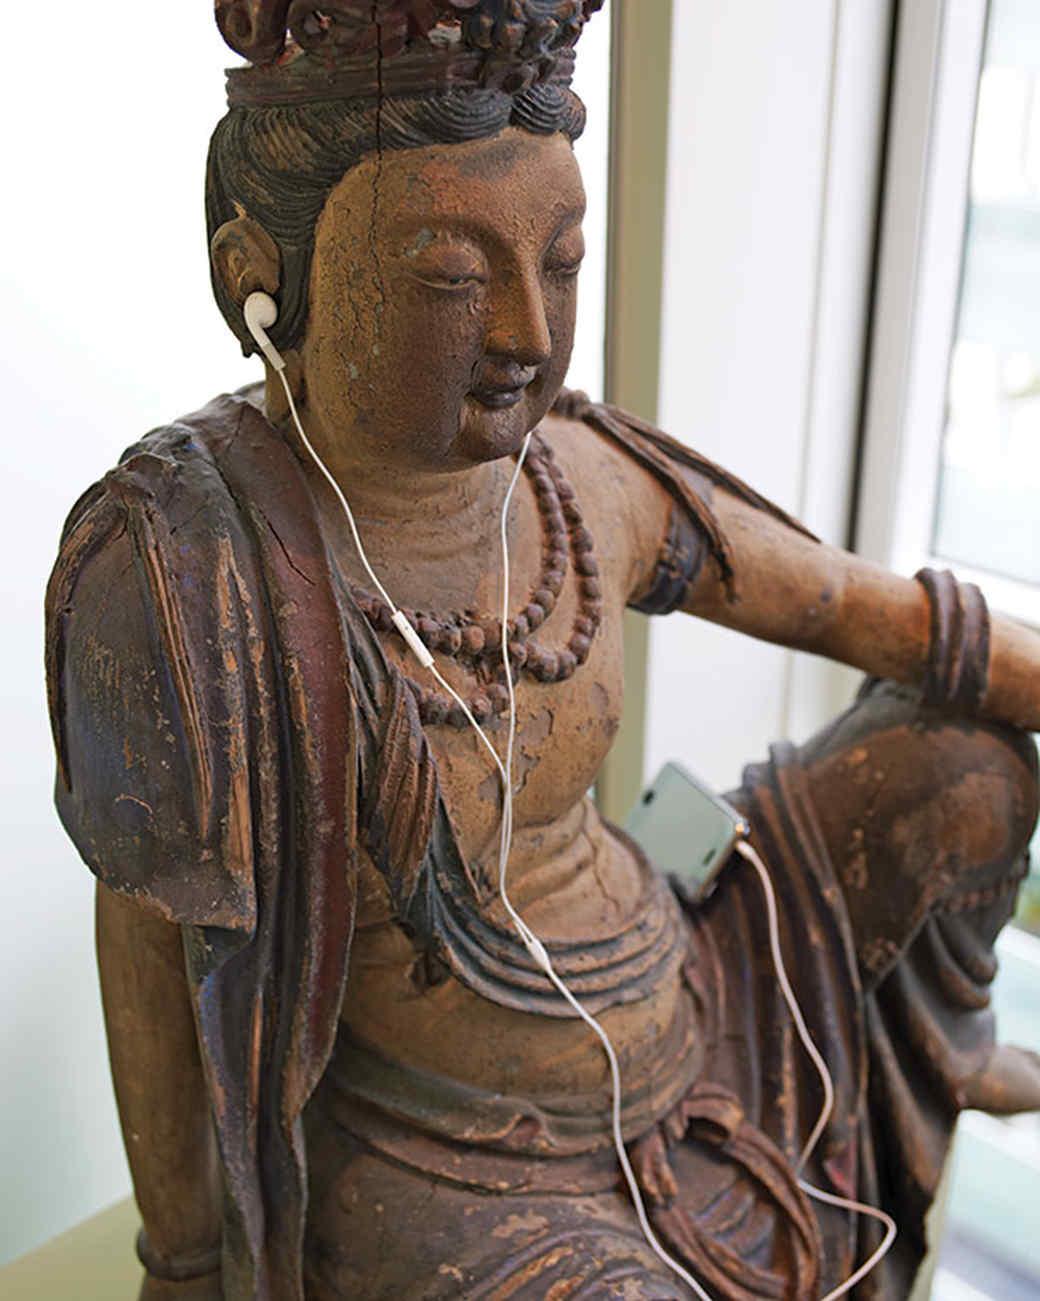 md106055_0910_statue_2_21529.jpg